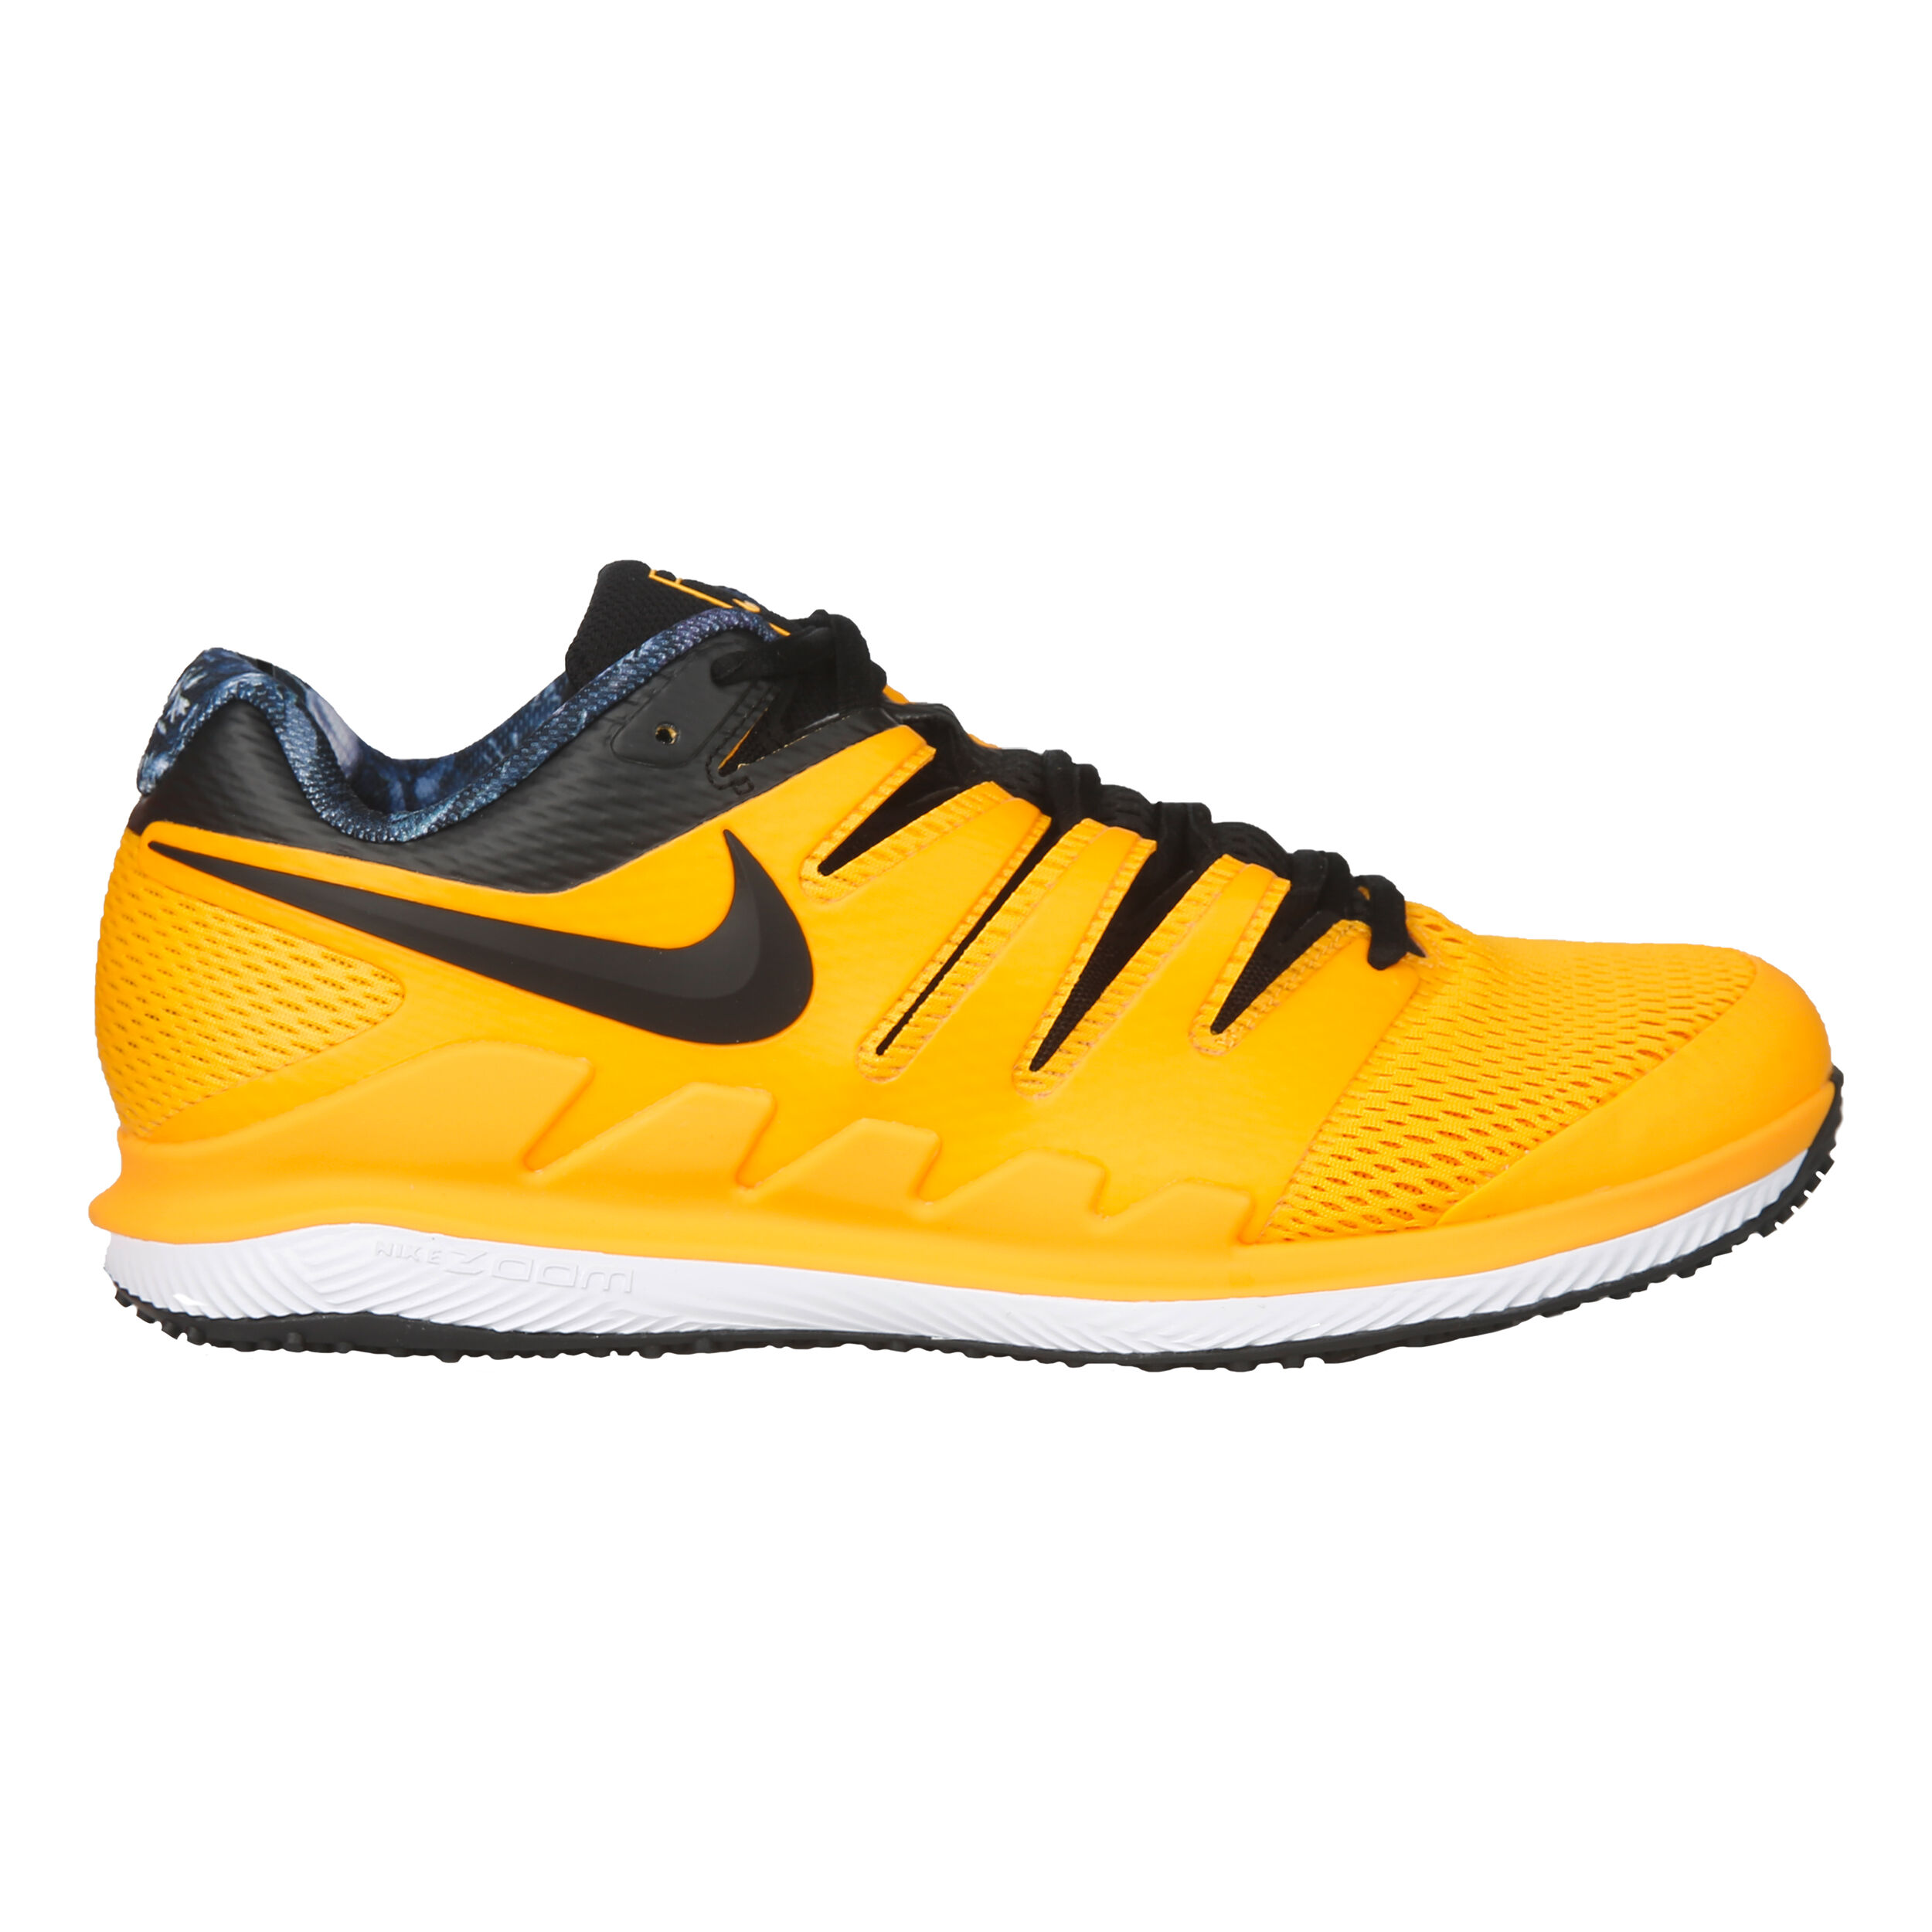 10 Italia Nike Tennis Uomo (Donna) Air Zoom Vapor X Rubber